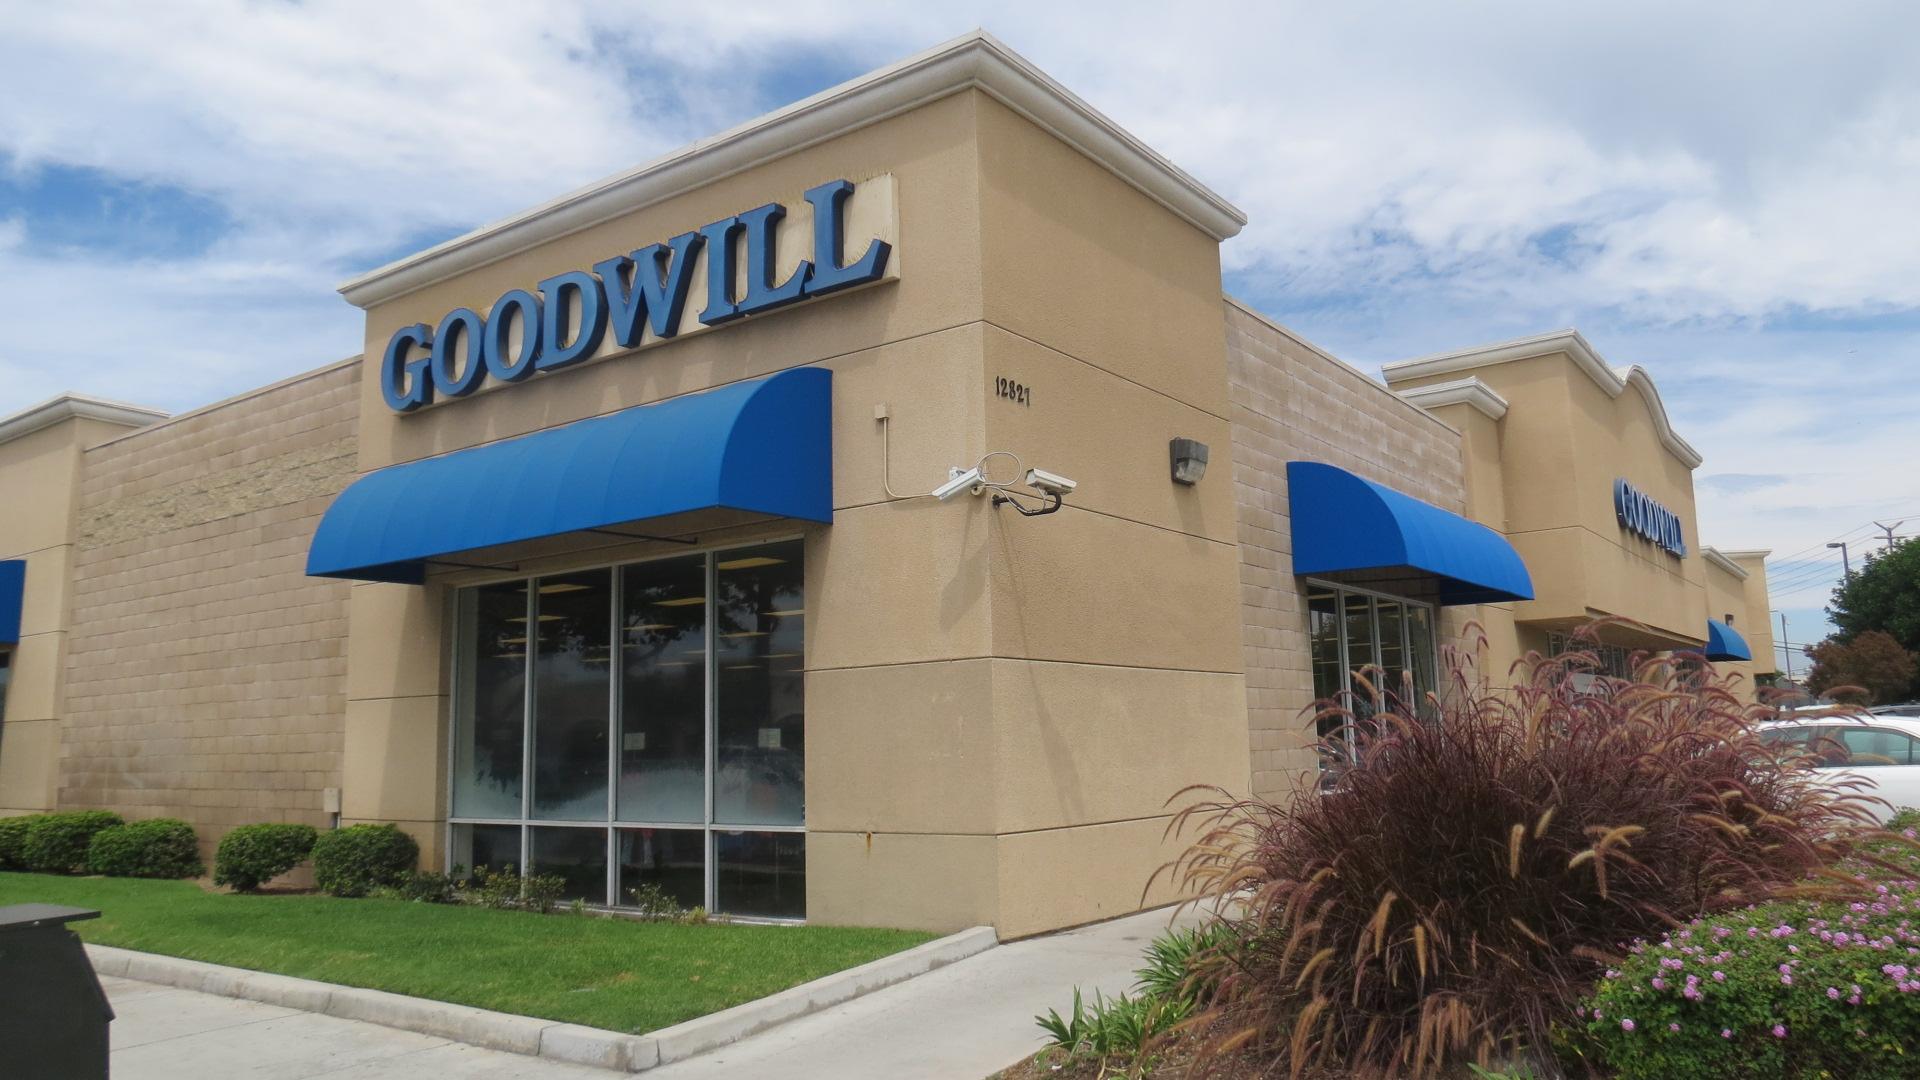 Norwalk Goodwill Retail Store & Donation Center